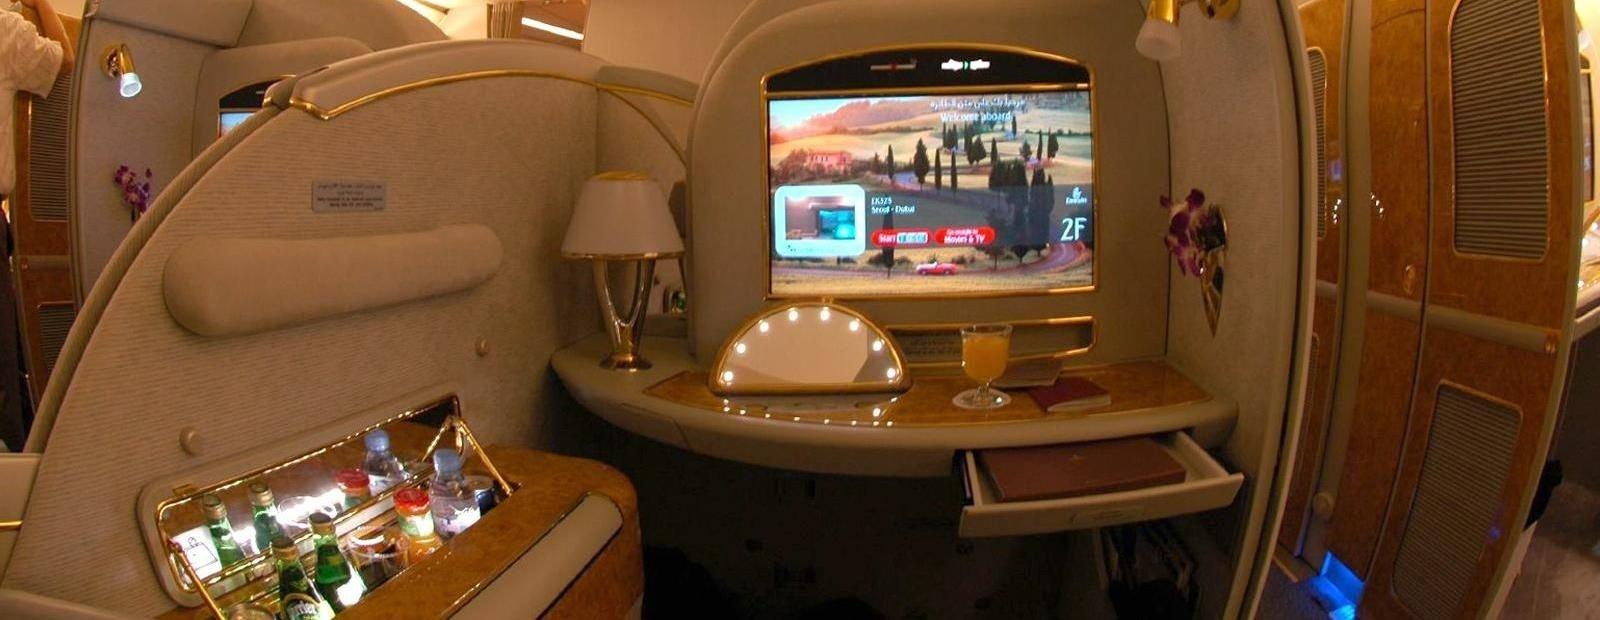 La primera clase de Emirates.